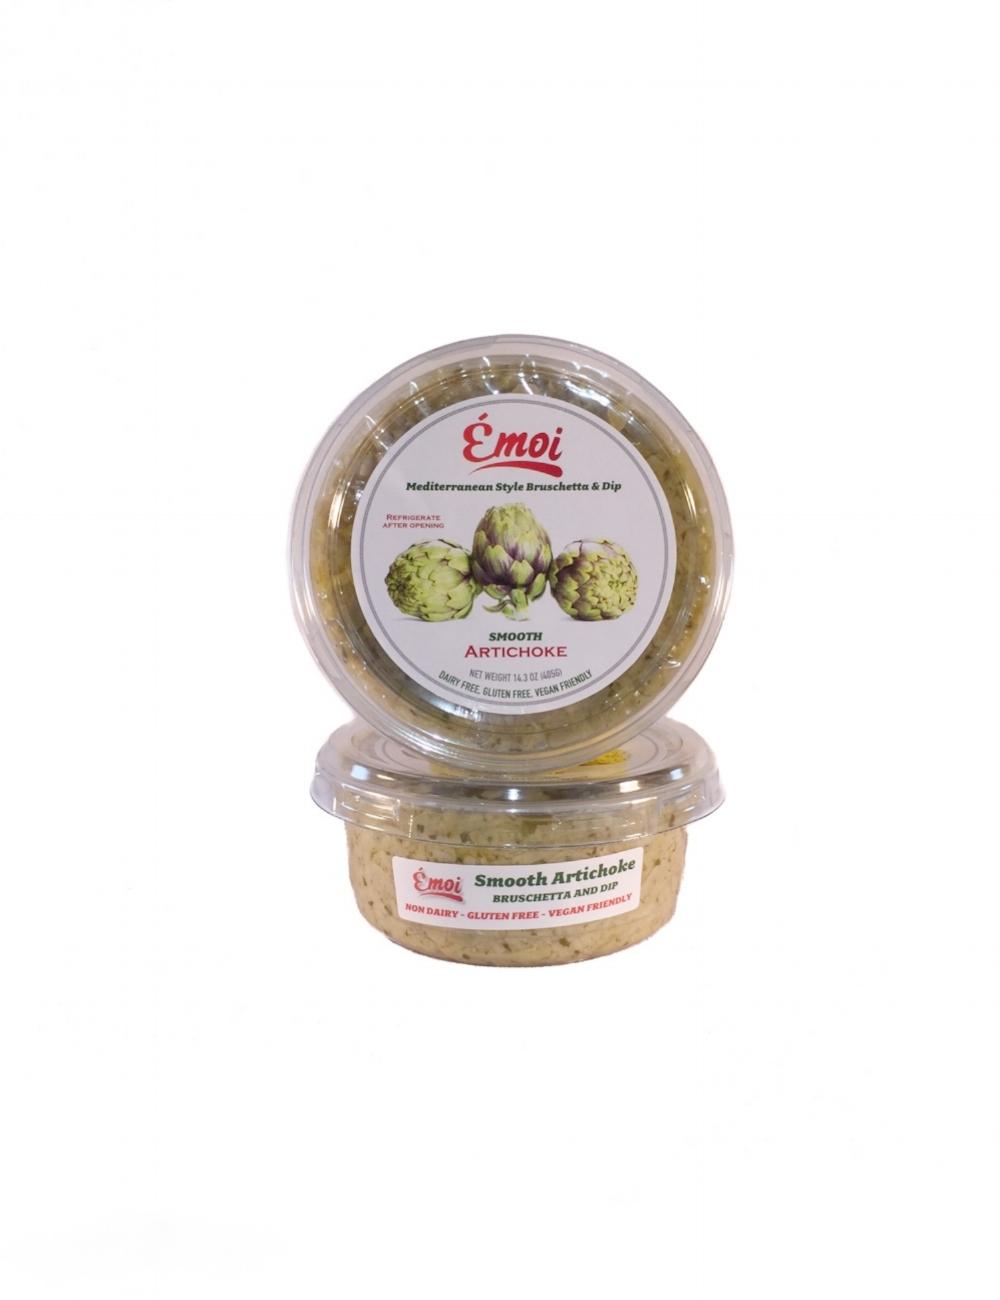 Mediterranean Style Artichoke Dip Smooth